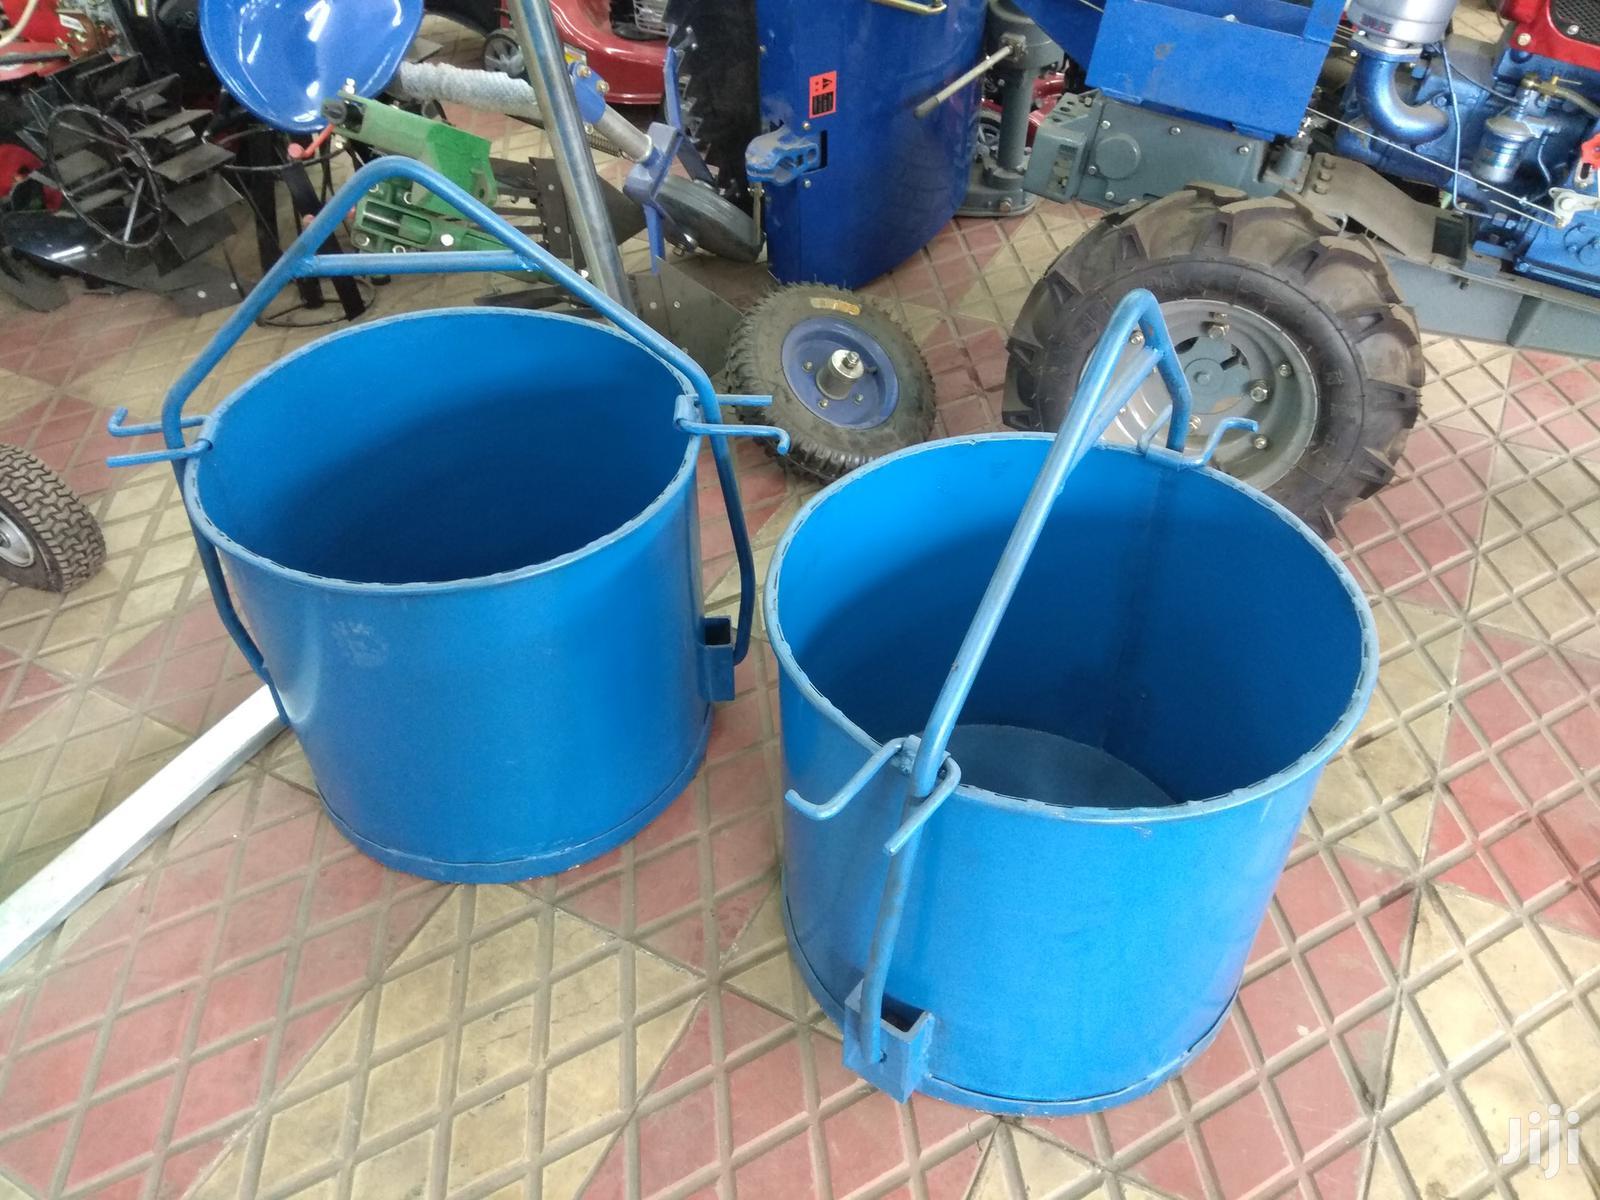 2020 Maker Italy Concrete Hoist Crane 0.5 Ton And 1 Ton | Manufacturing Equipment for sale in Ngara, Nairobi, Kenya